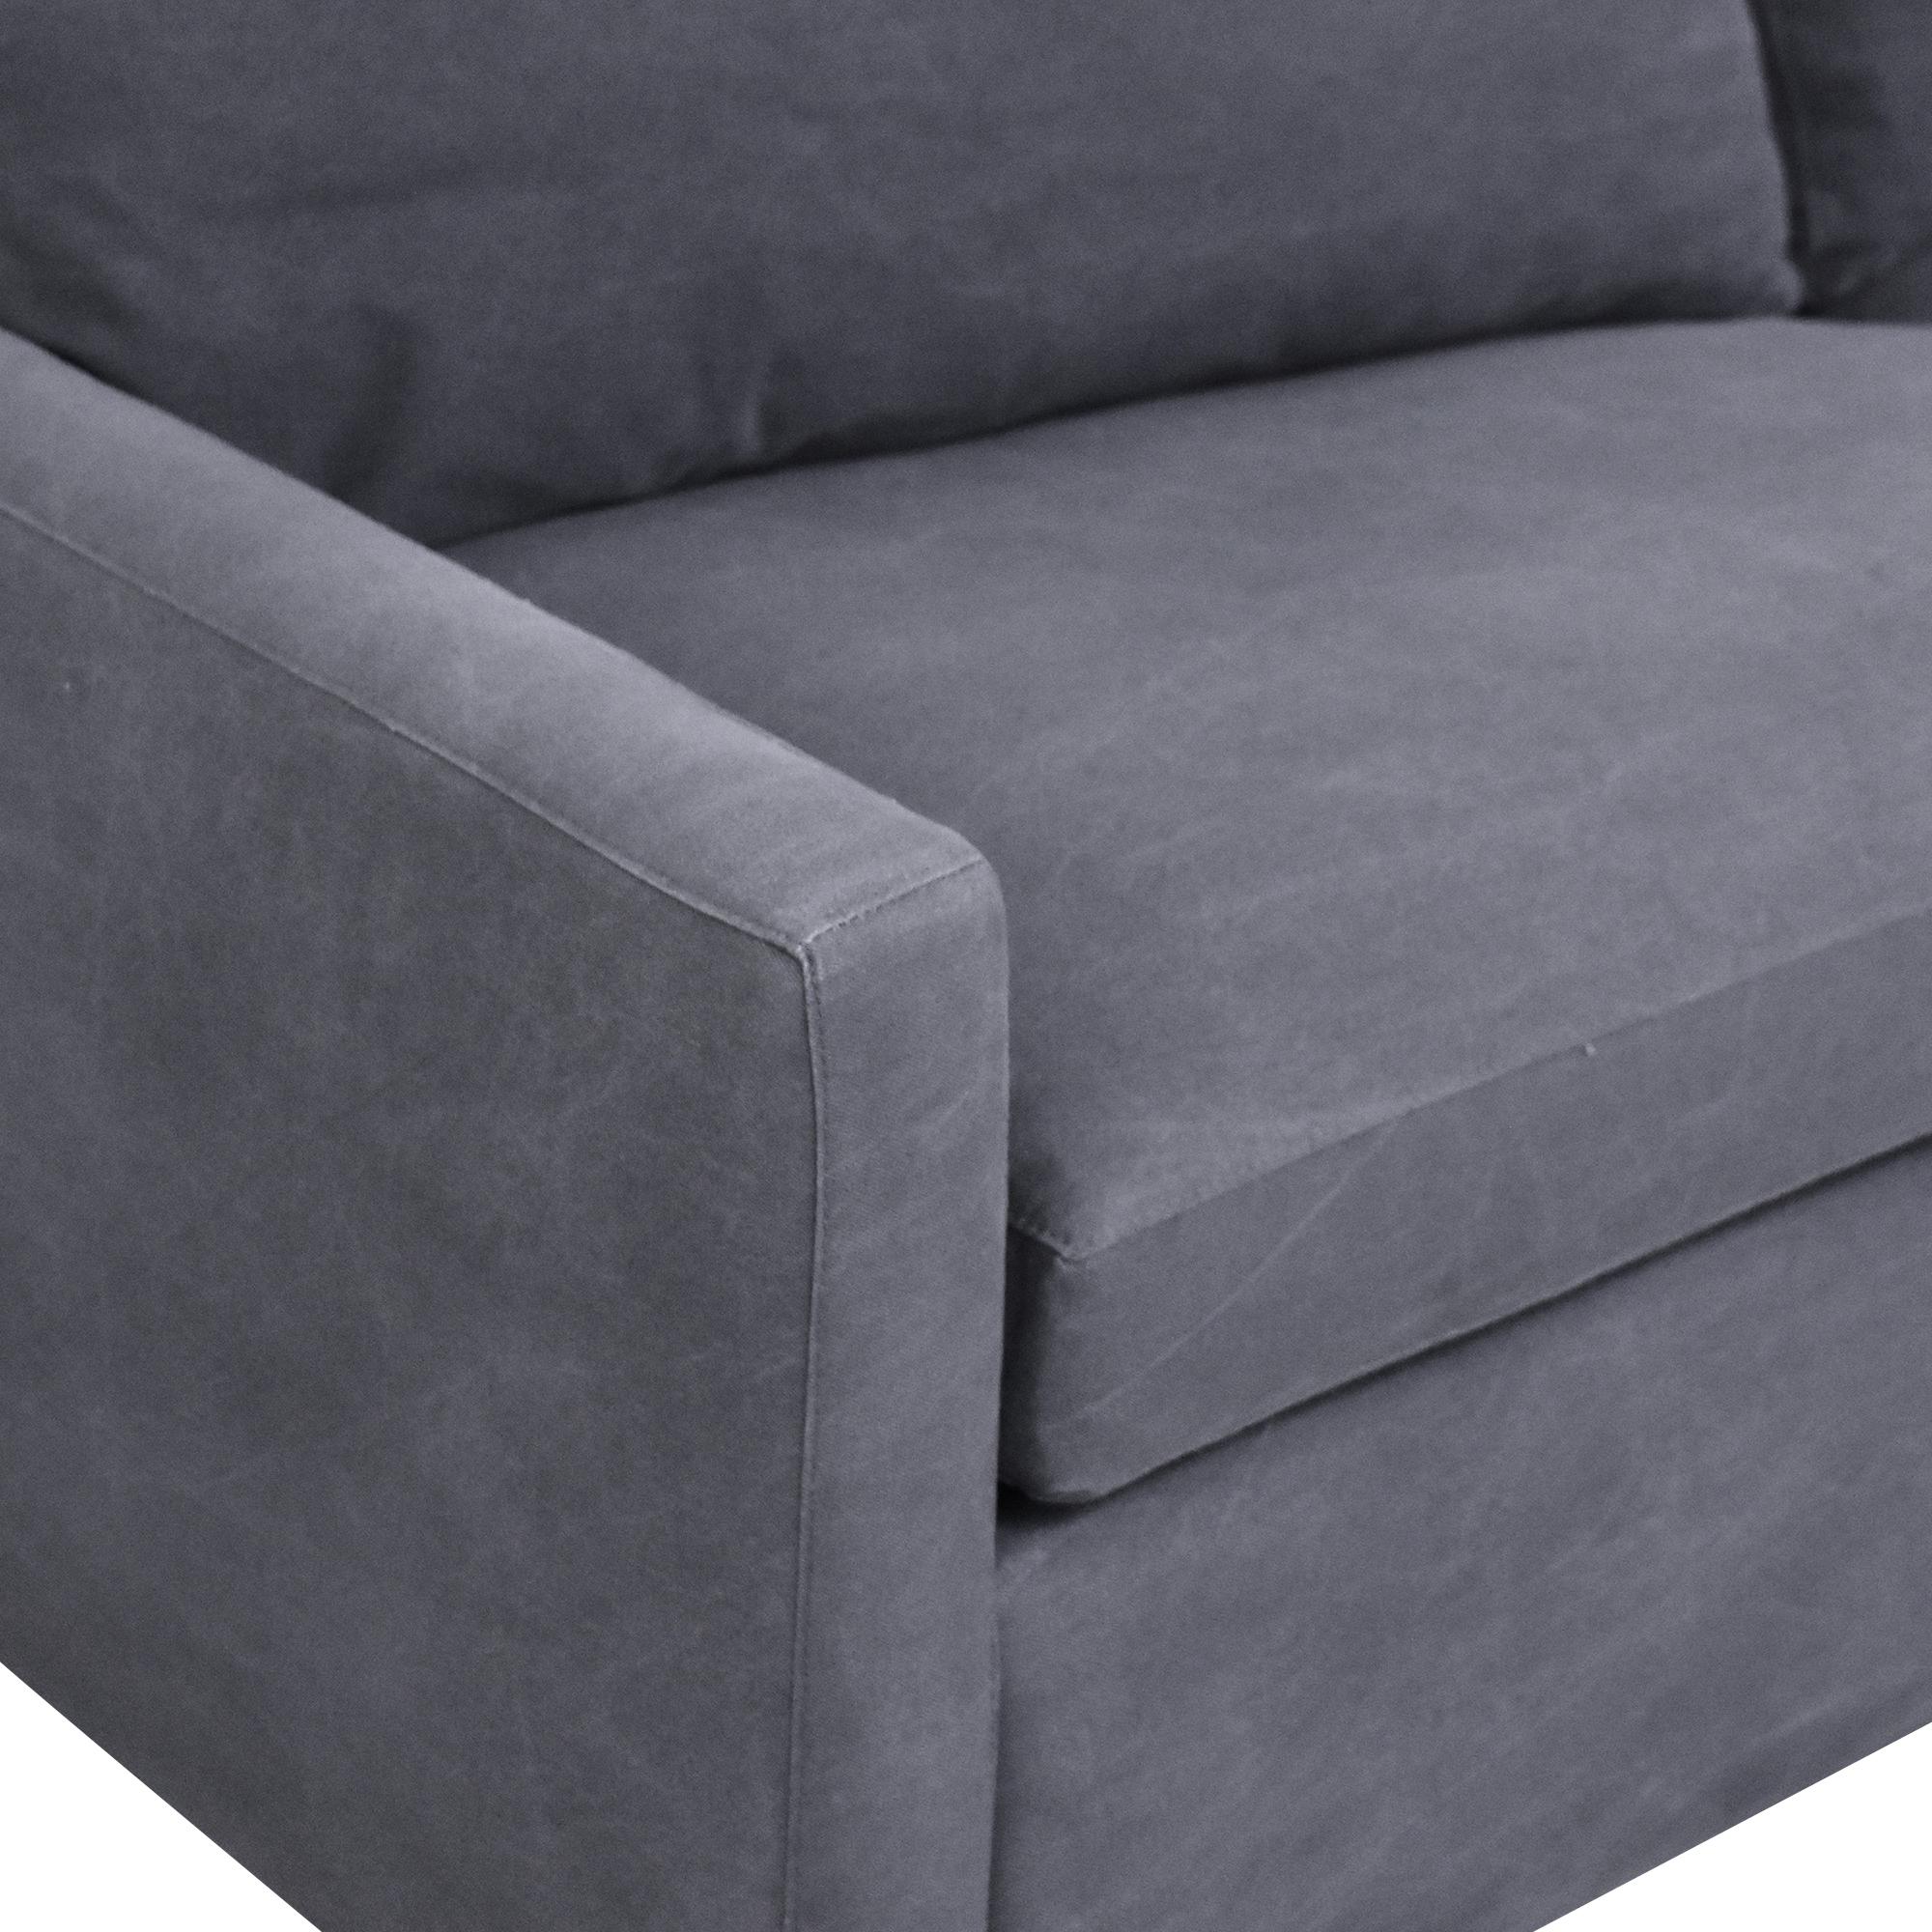 ABC Carpet & Home  ABC Carpet & Home Cobble Hill Lucali Sleeper Sectional Sofas